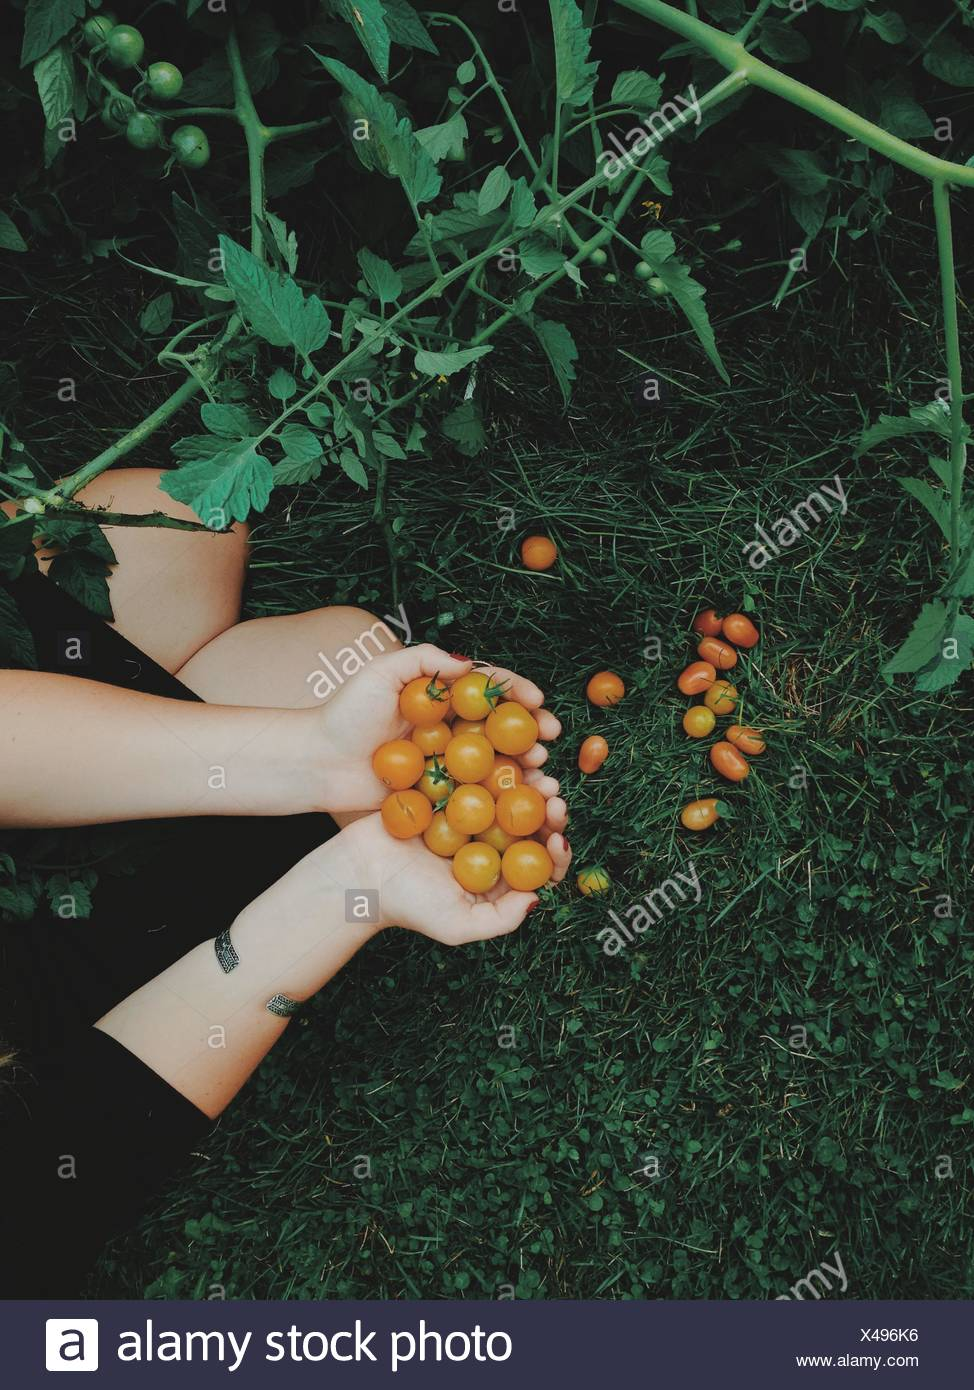 Mujer recogiendo tomates frescos Foto de stock